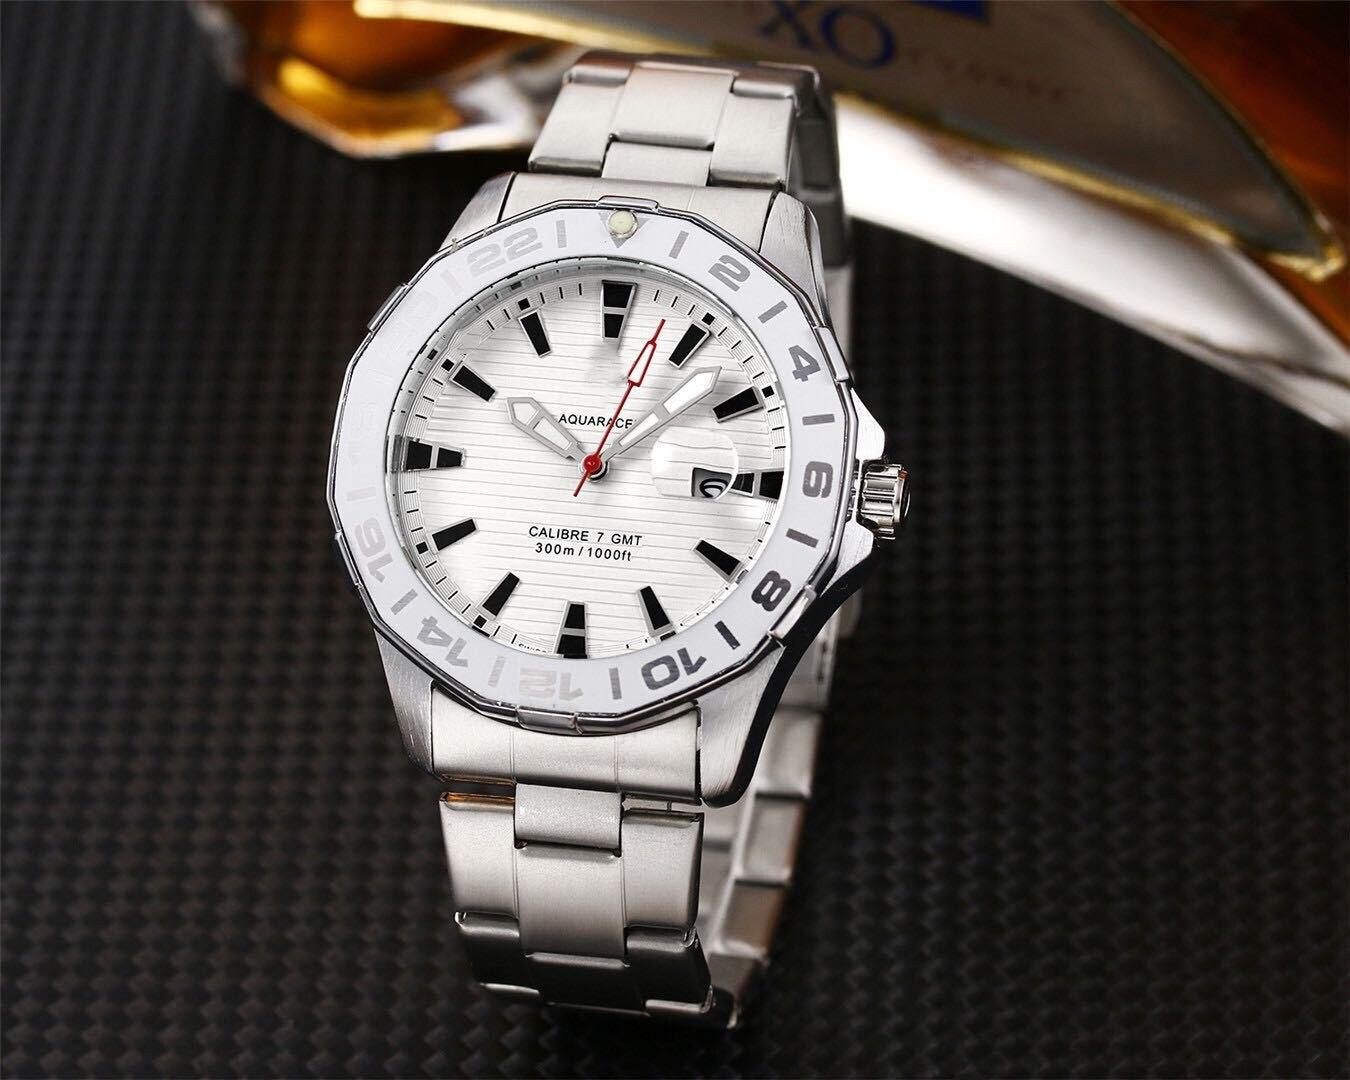 waz2114ba0875-men-watches-quartz-top-brand-luxury-watch-men-tonneau-automatic-tourbillon-business-aquaracer-wristwatch-for-man